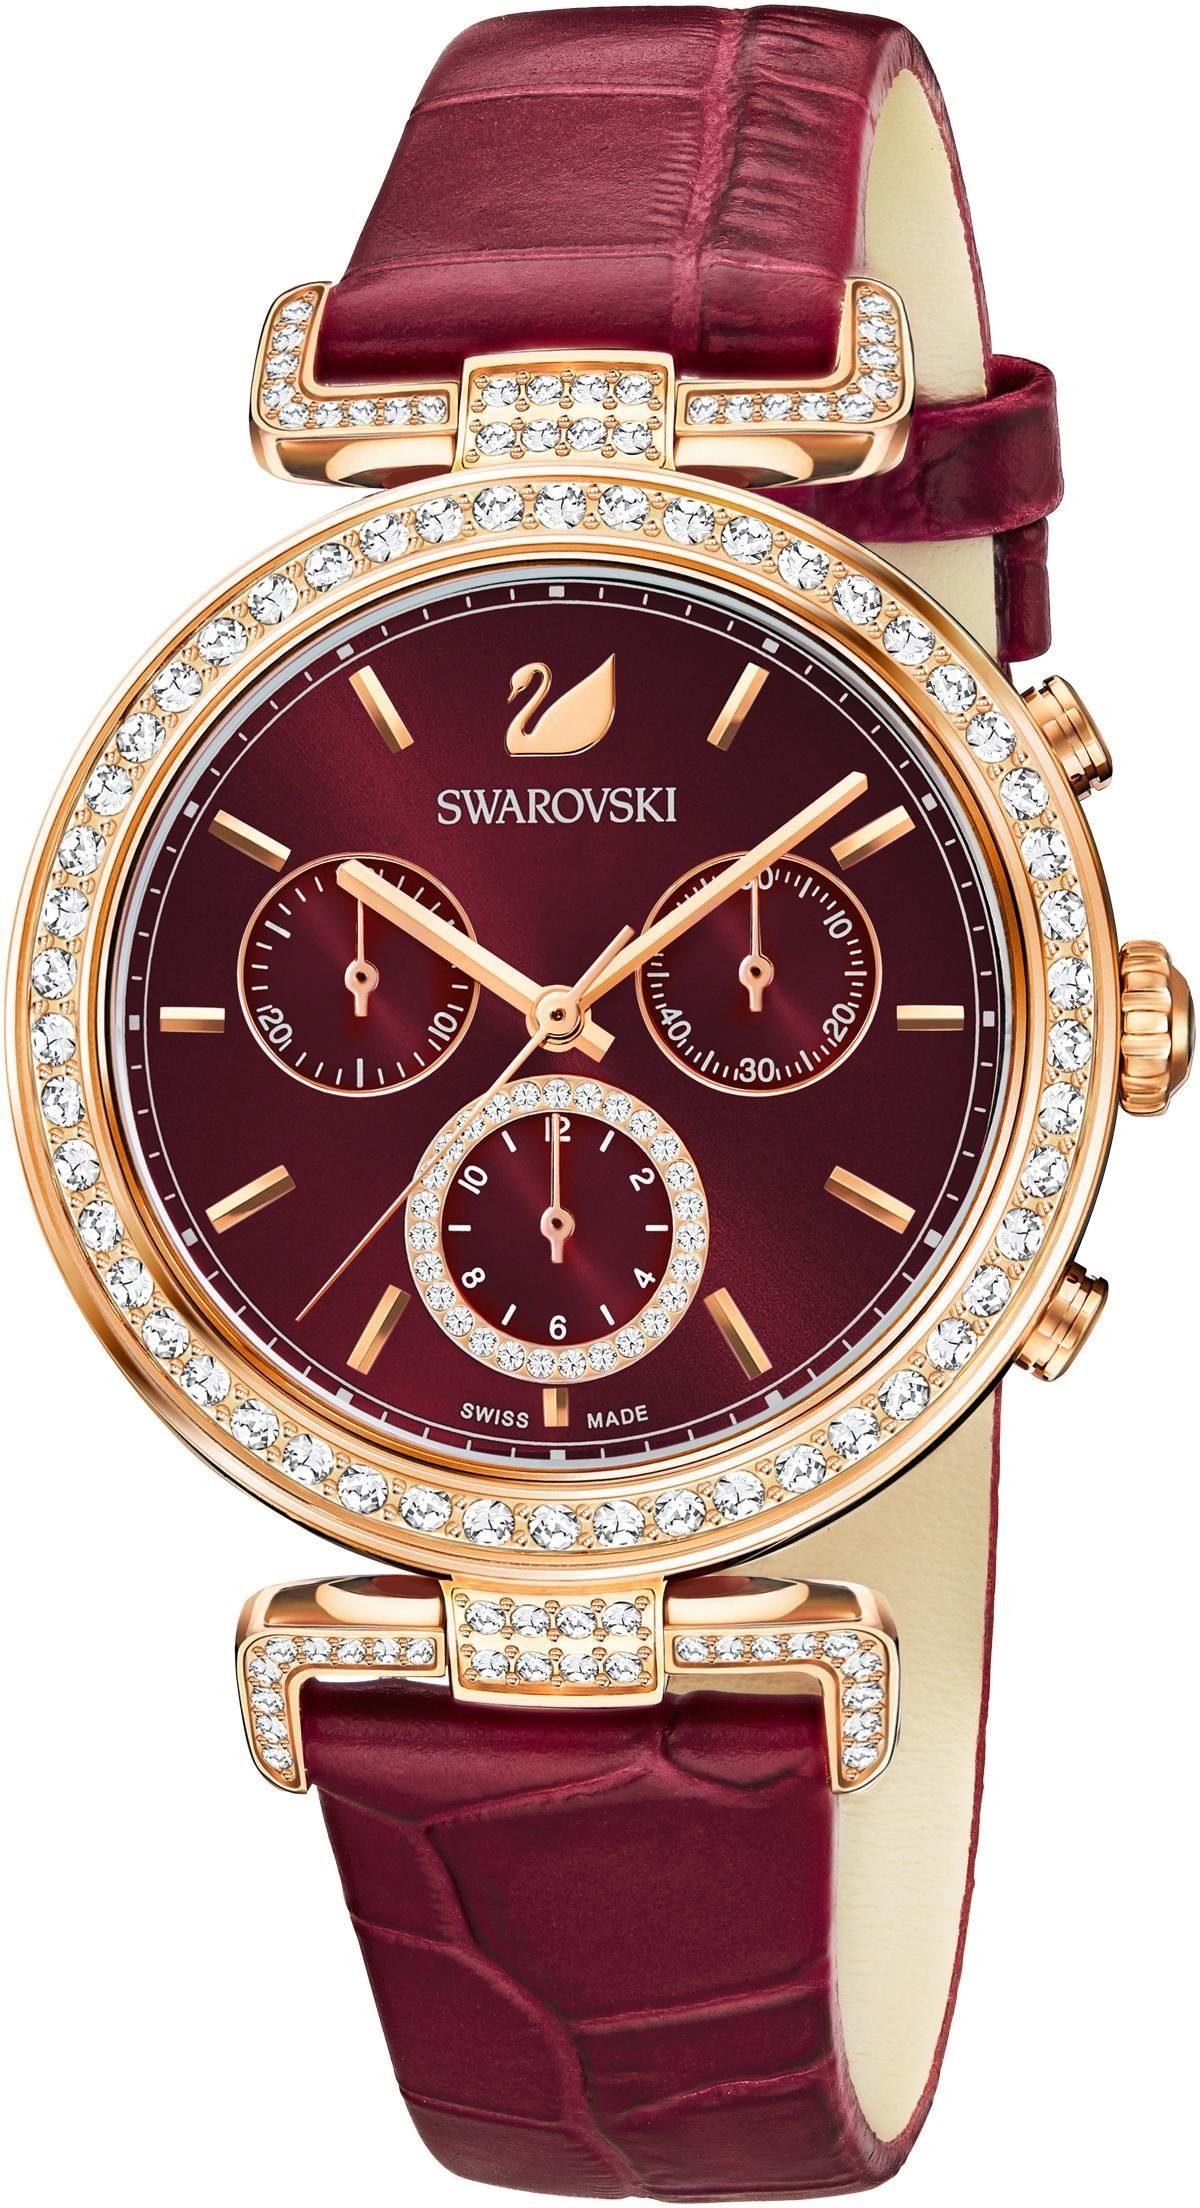 Swarovski Chronograph »Era Journey, 5416701«